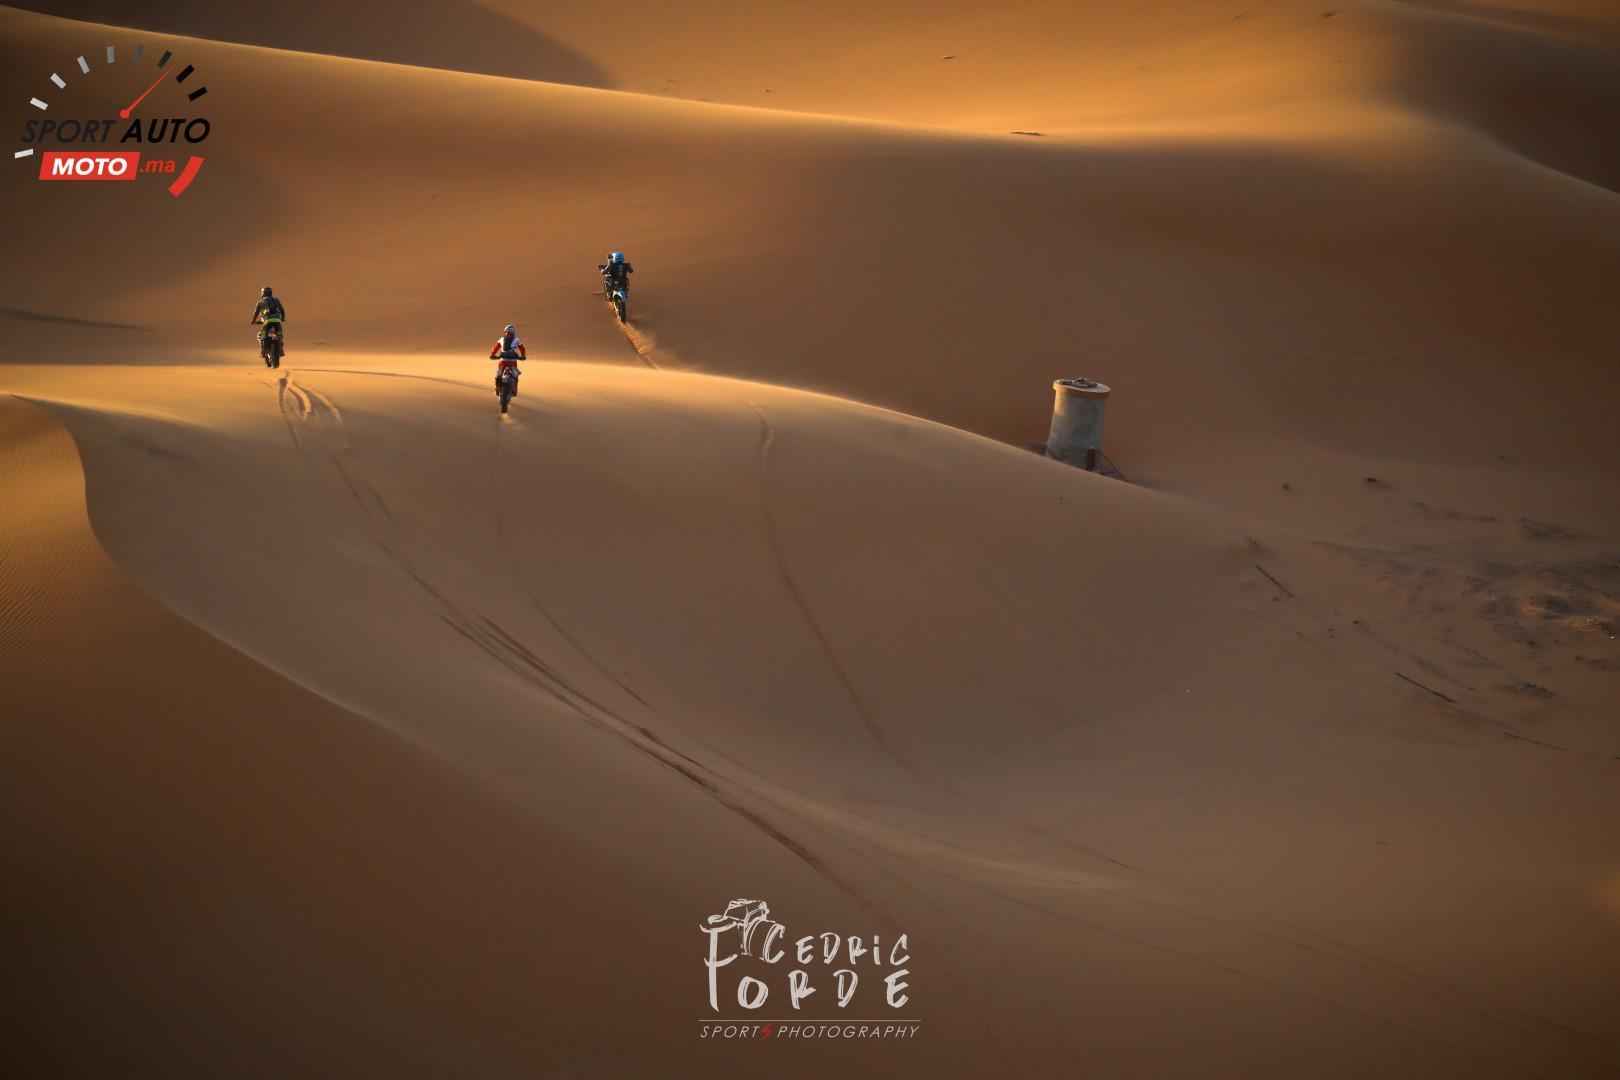 hearts-of-morocco-2018-cherednikov-et-engel-vainqueurs-sur-les-dunes-898-1.jpg